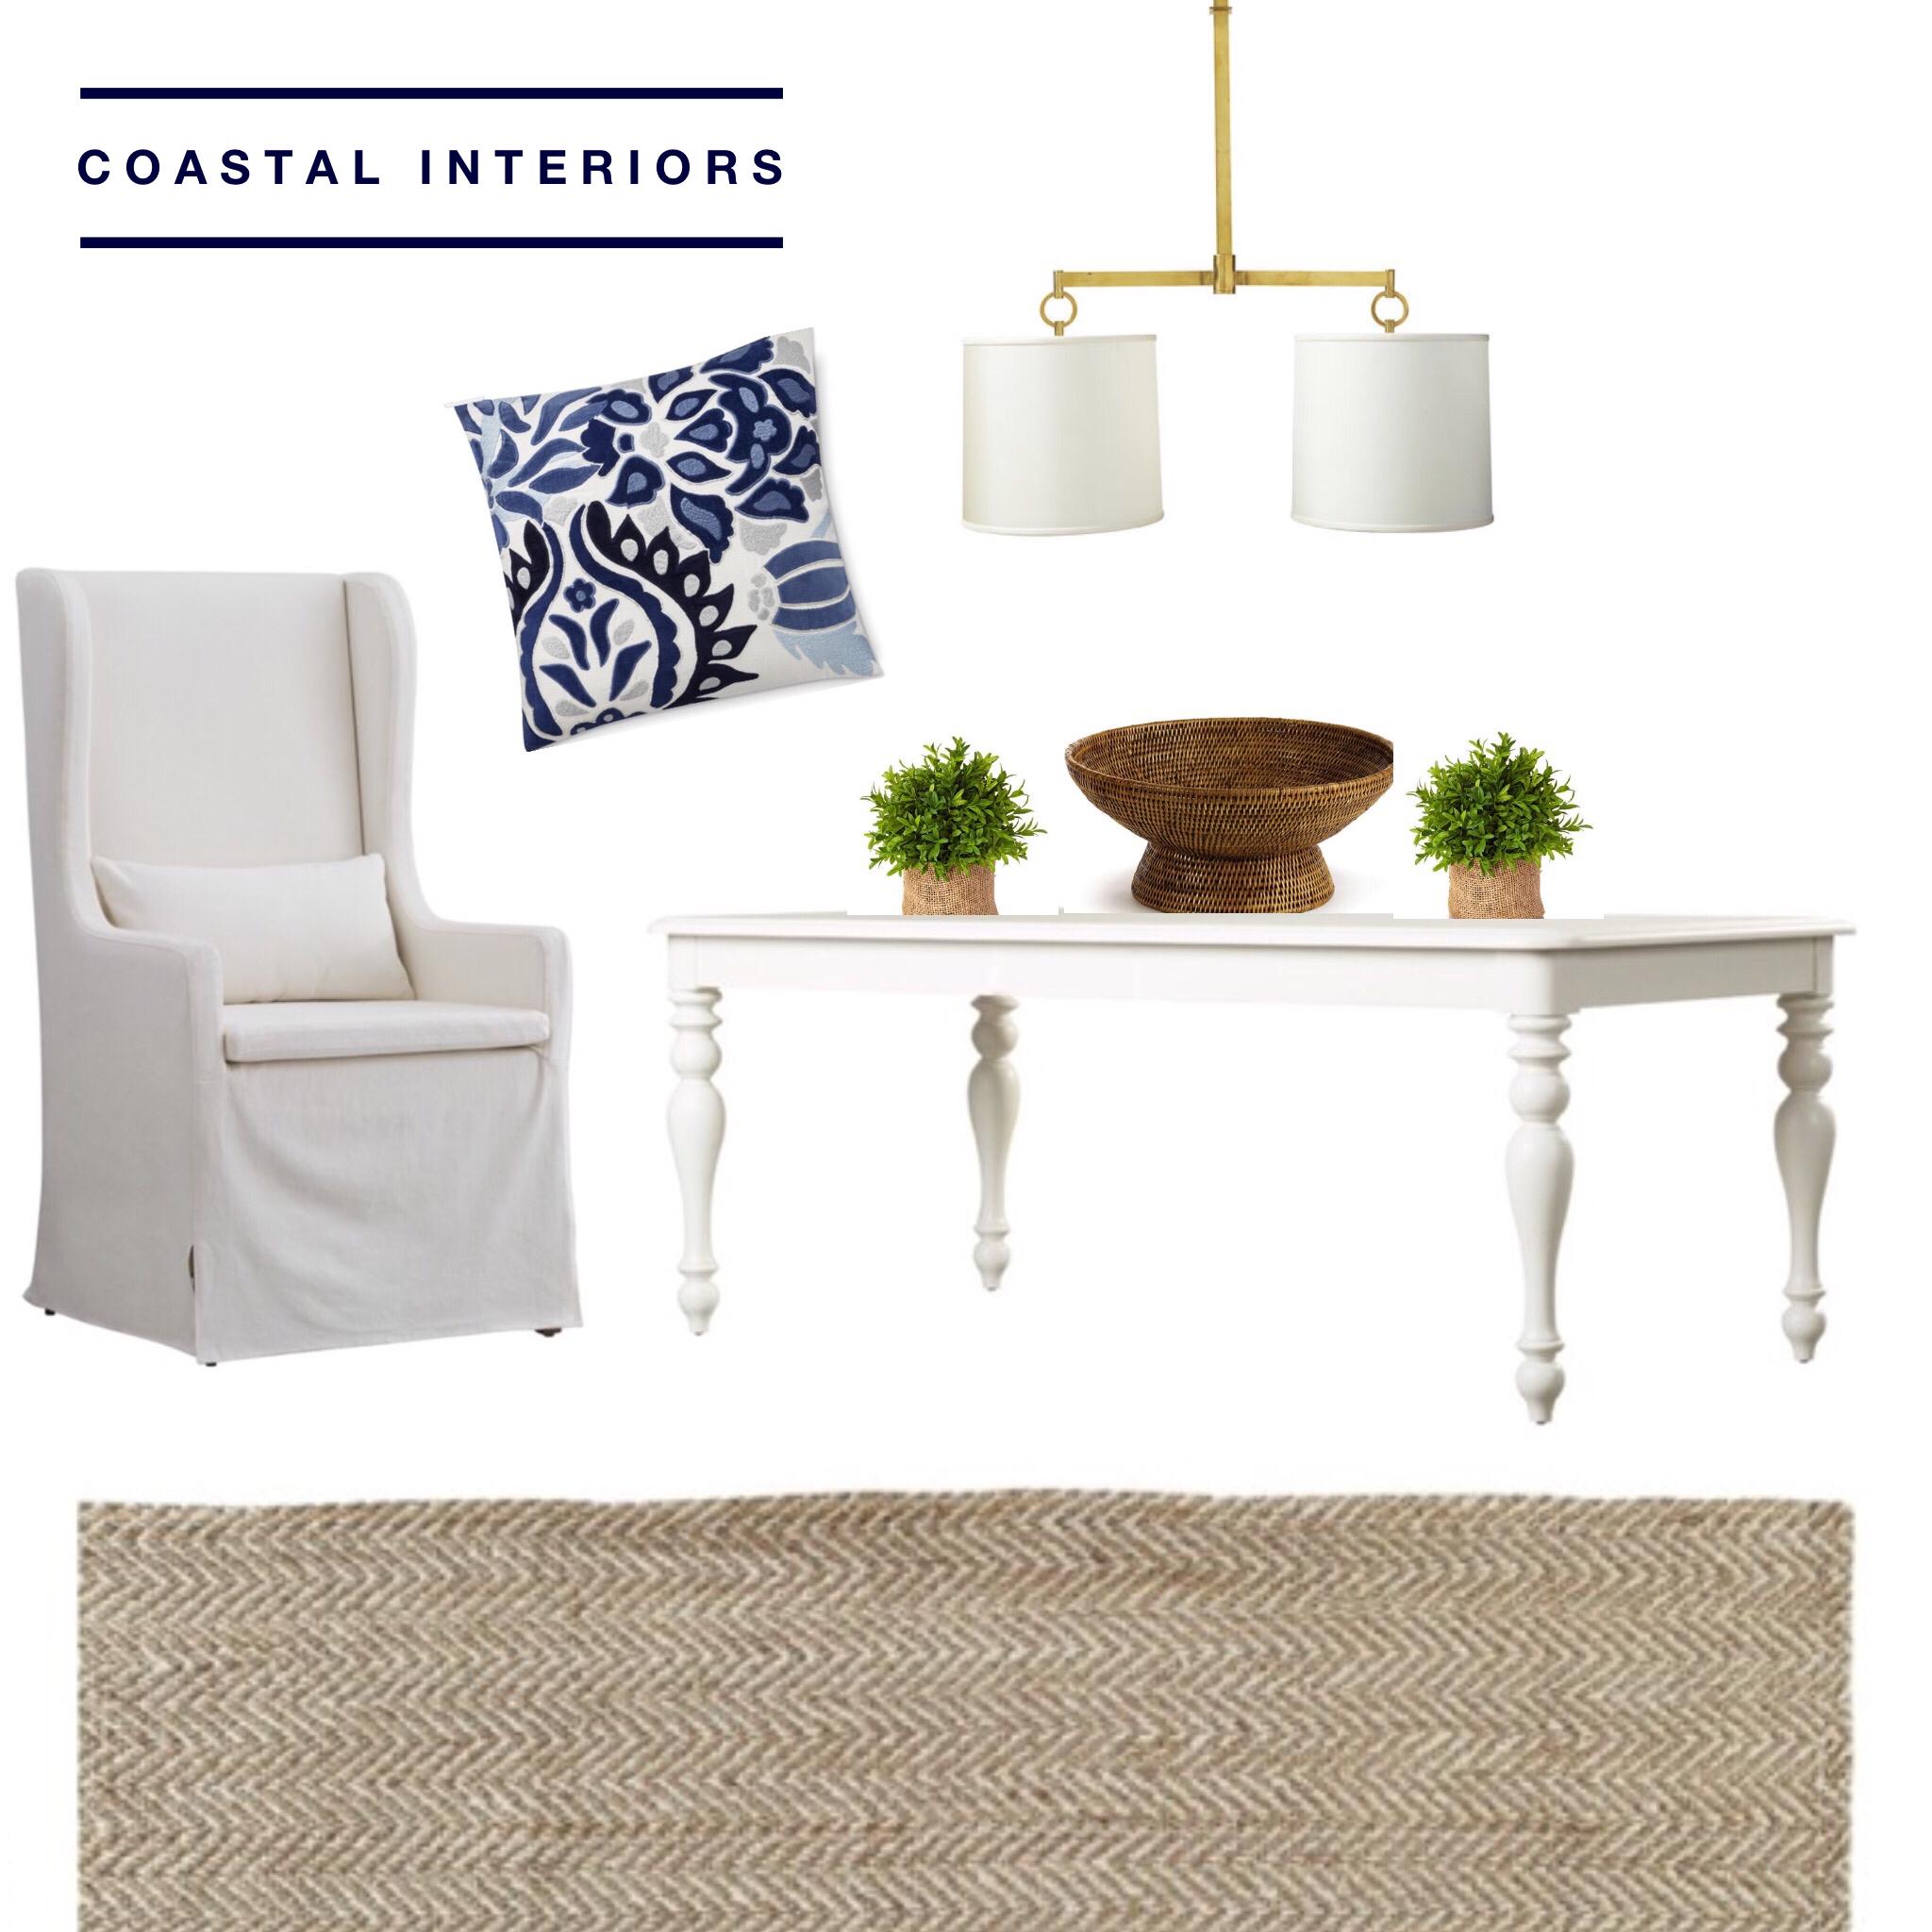 Coastal Interiors: Dining Room